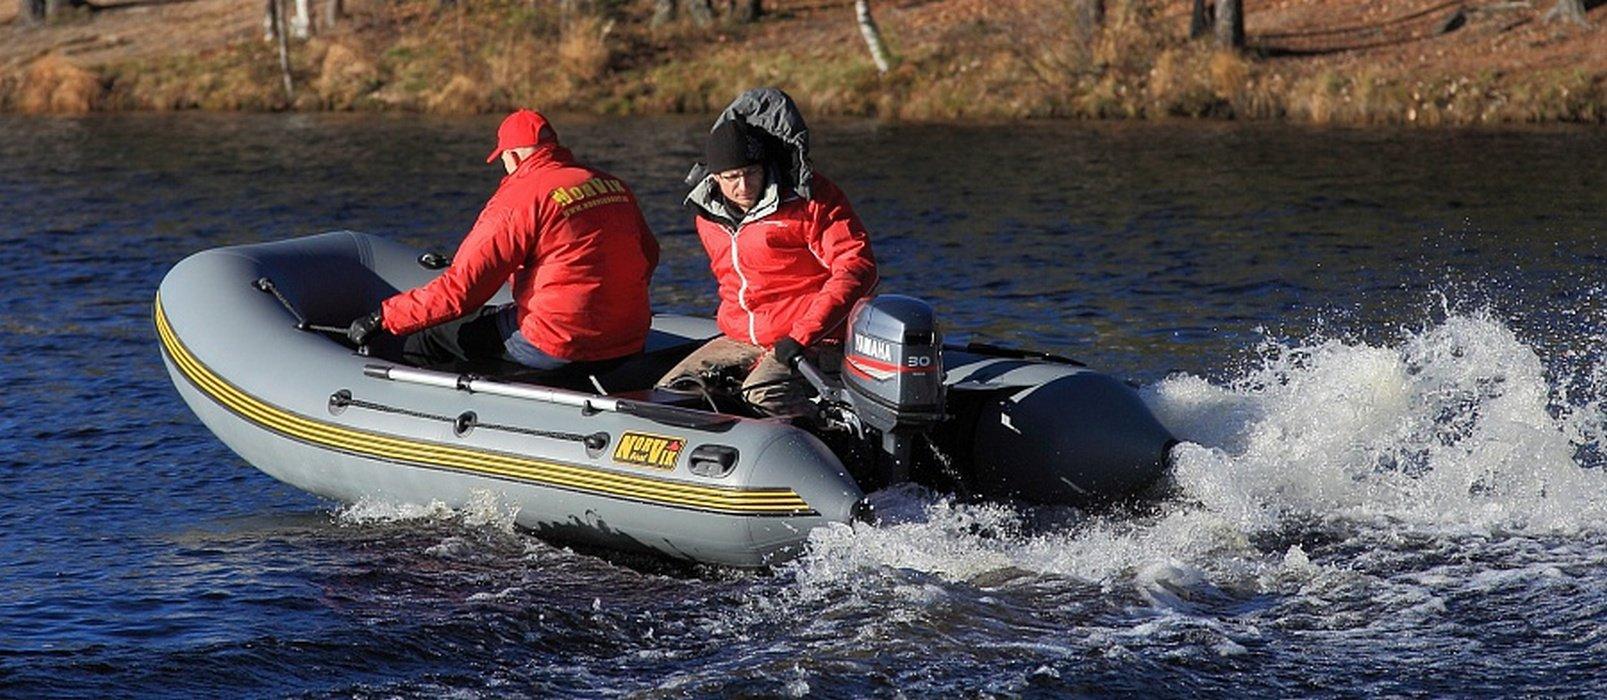 купить мотор на лодку пвх иркутск